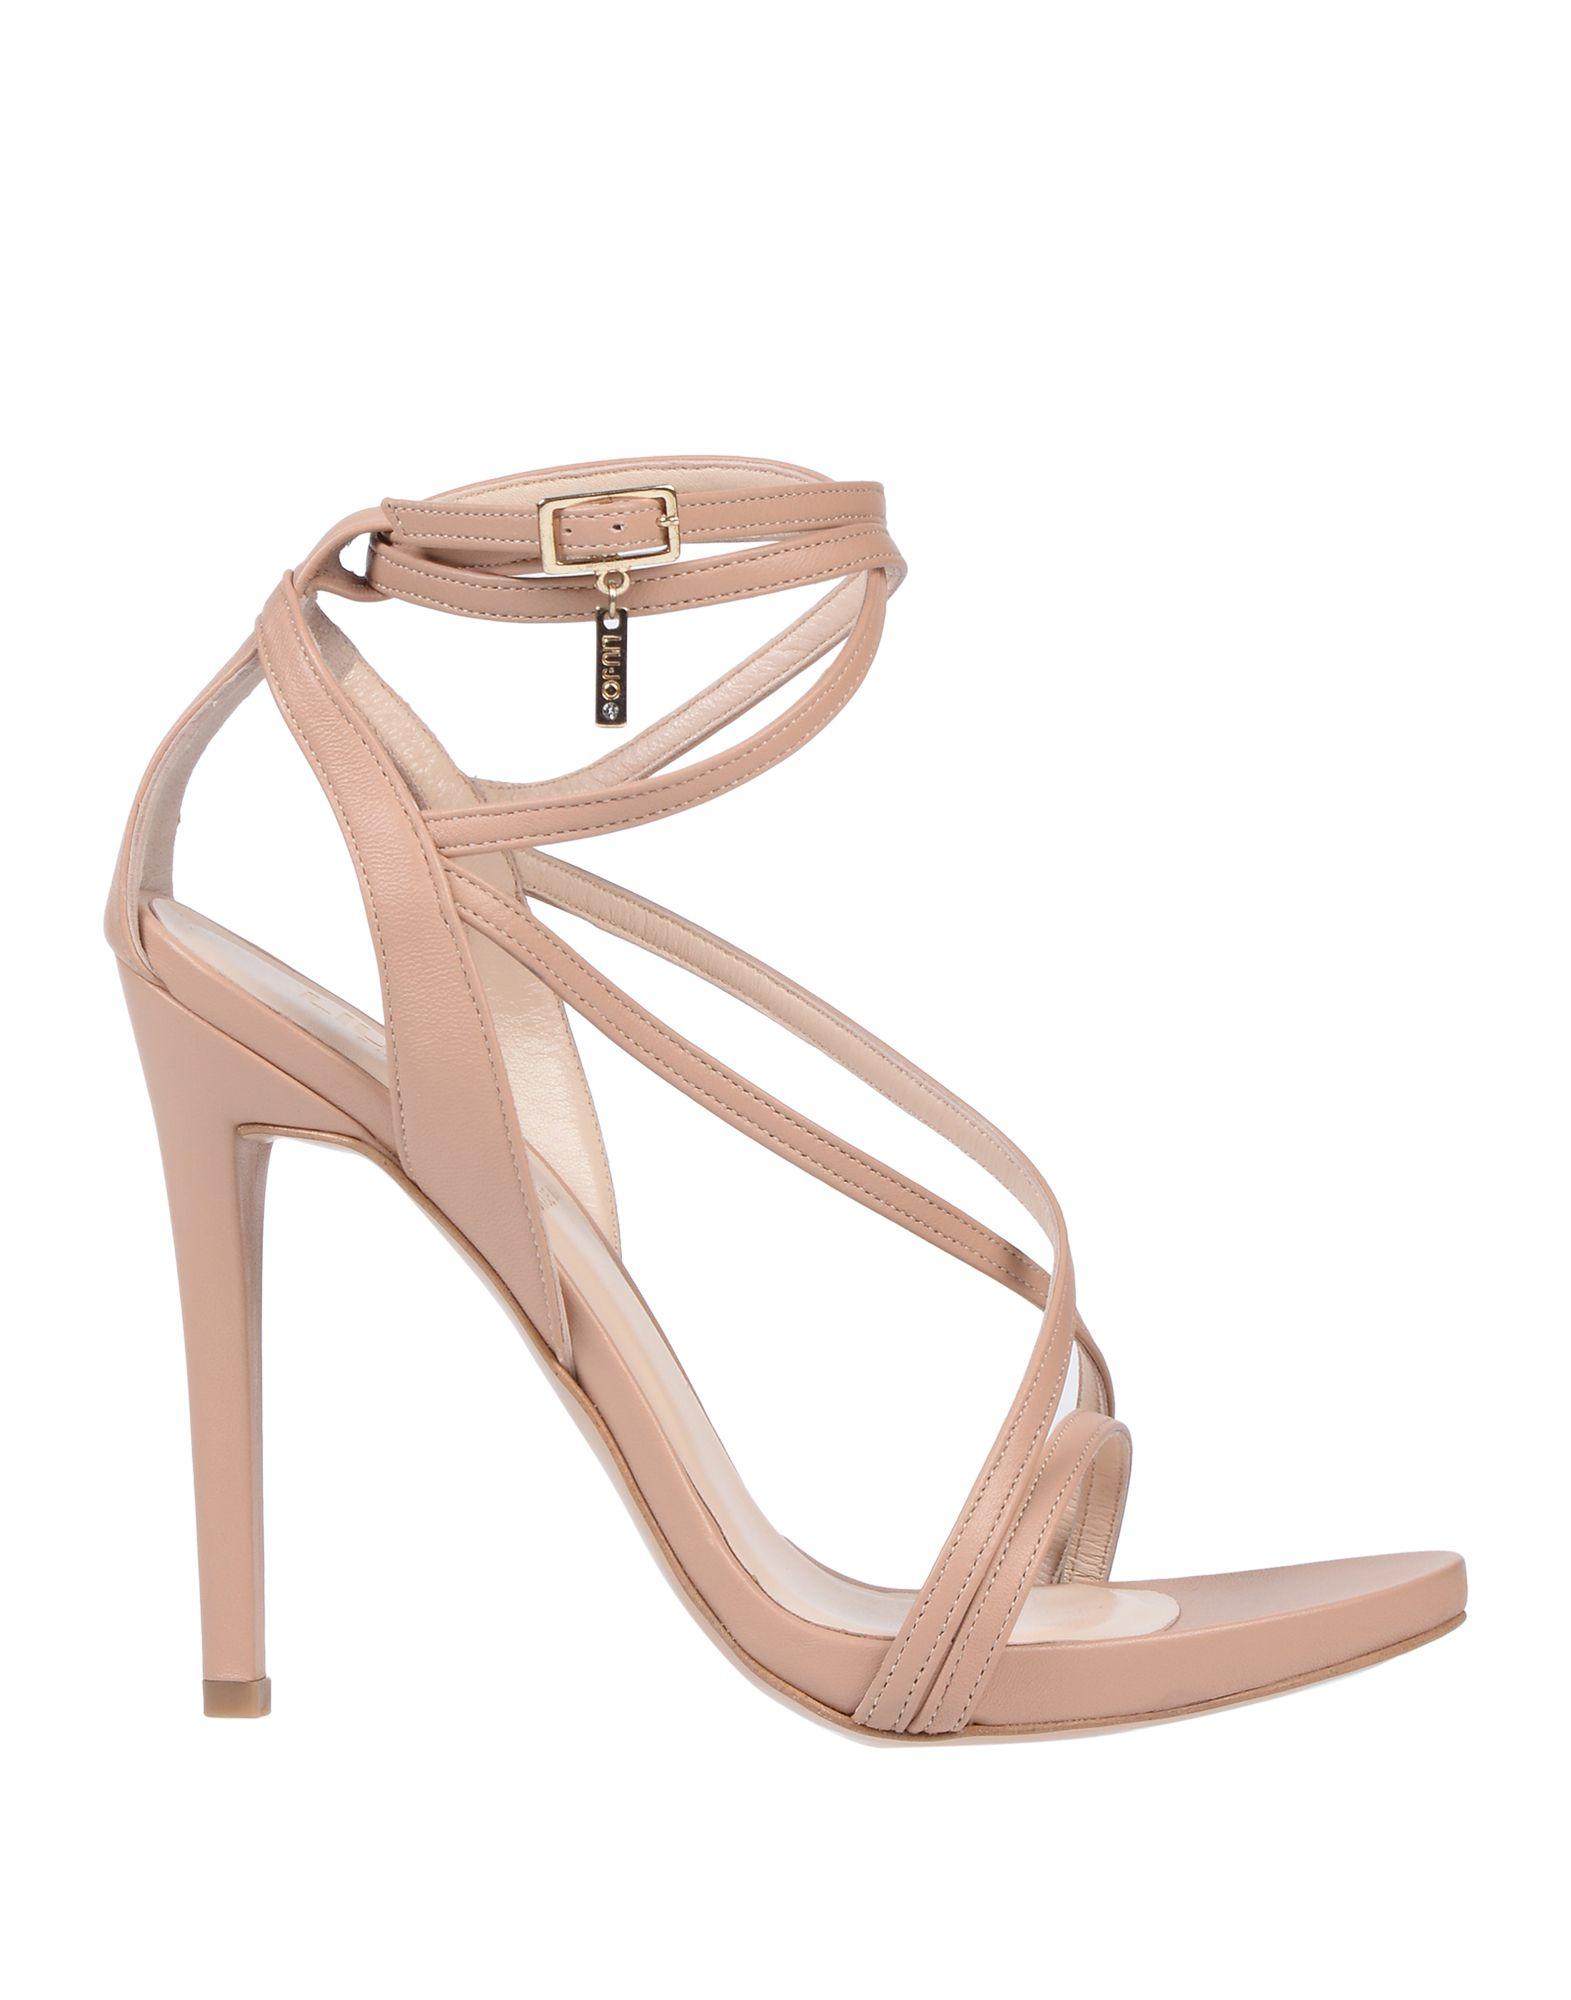 liujo chaussures sandales - femmes liujo chaussures sandales sur en ligne sur sandales canada - 11505155rr 9b8a34